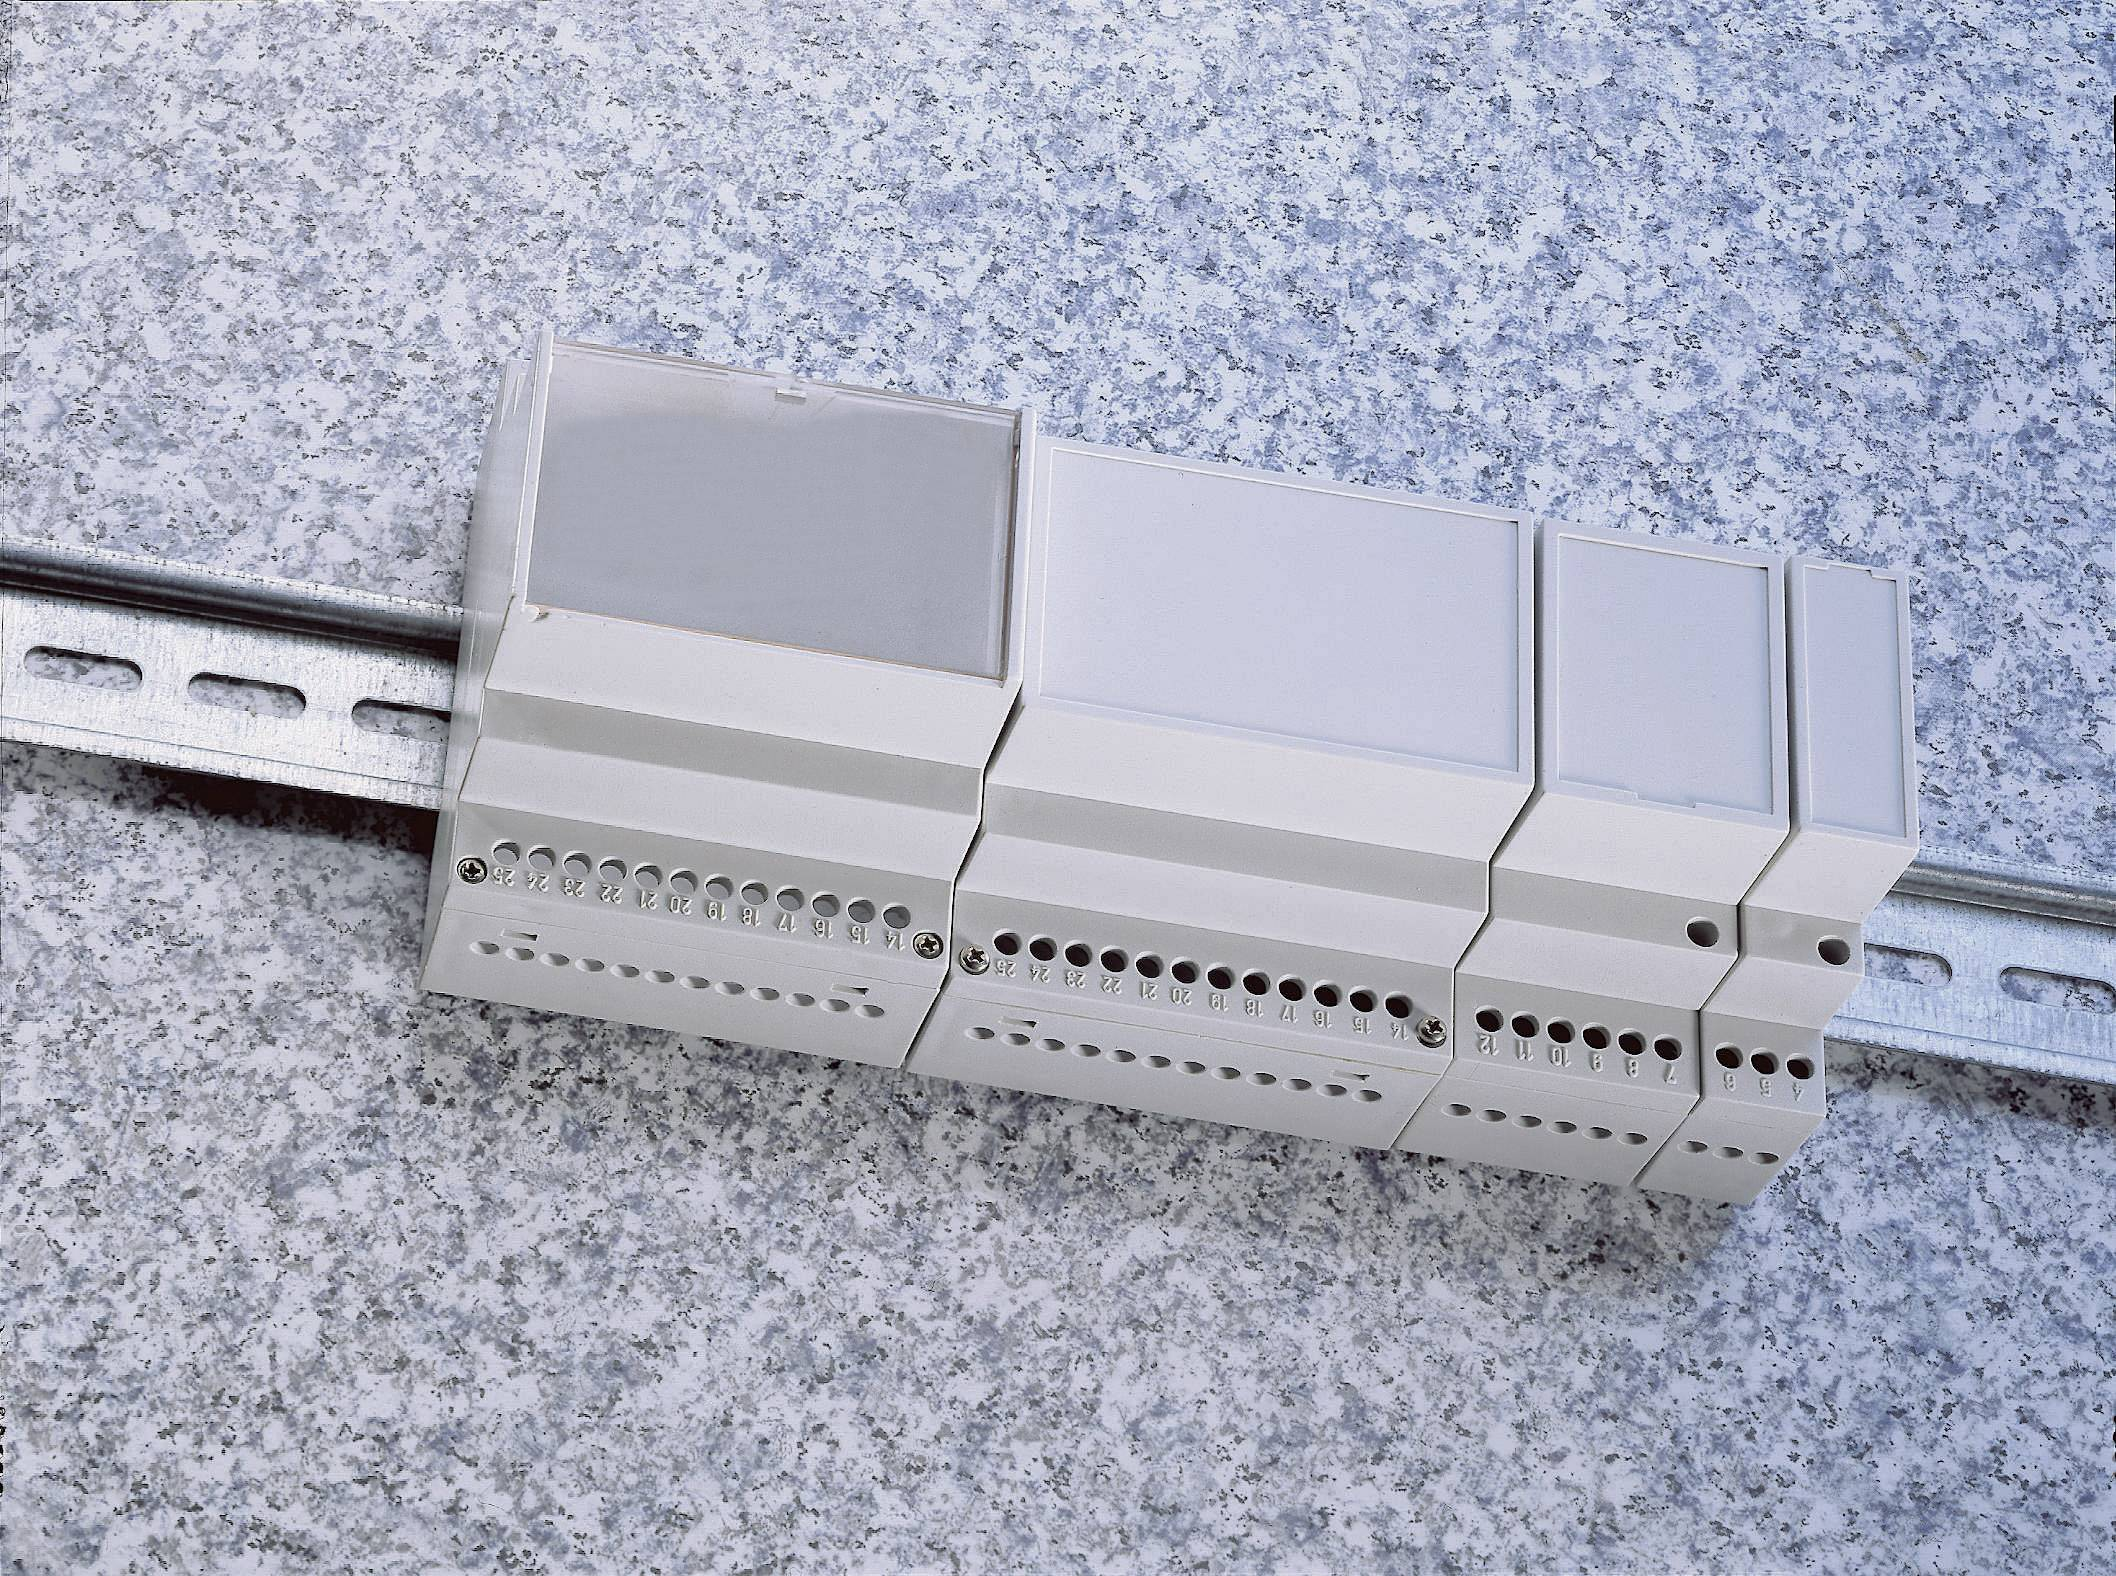 Pouzdro do lišty Weltron MR2/C FA RAL7035 ABS (018037129125), 35 x 90 x 68 mm